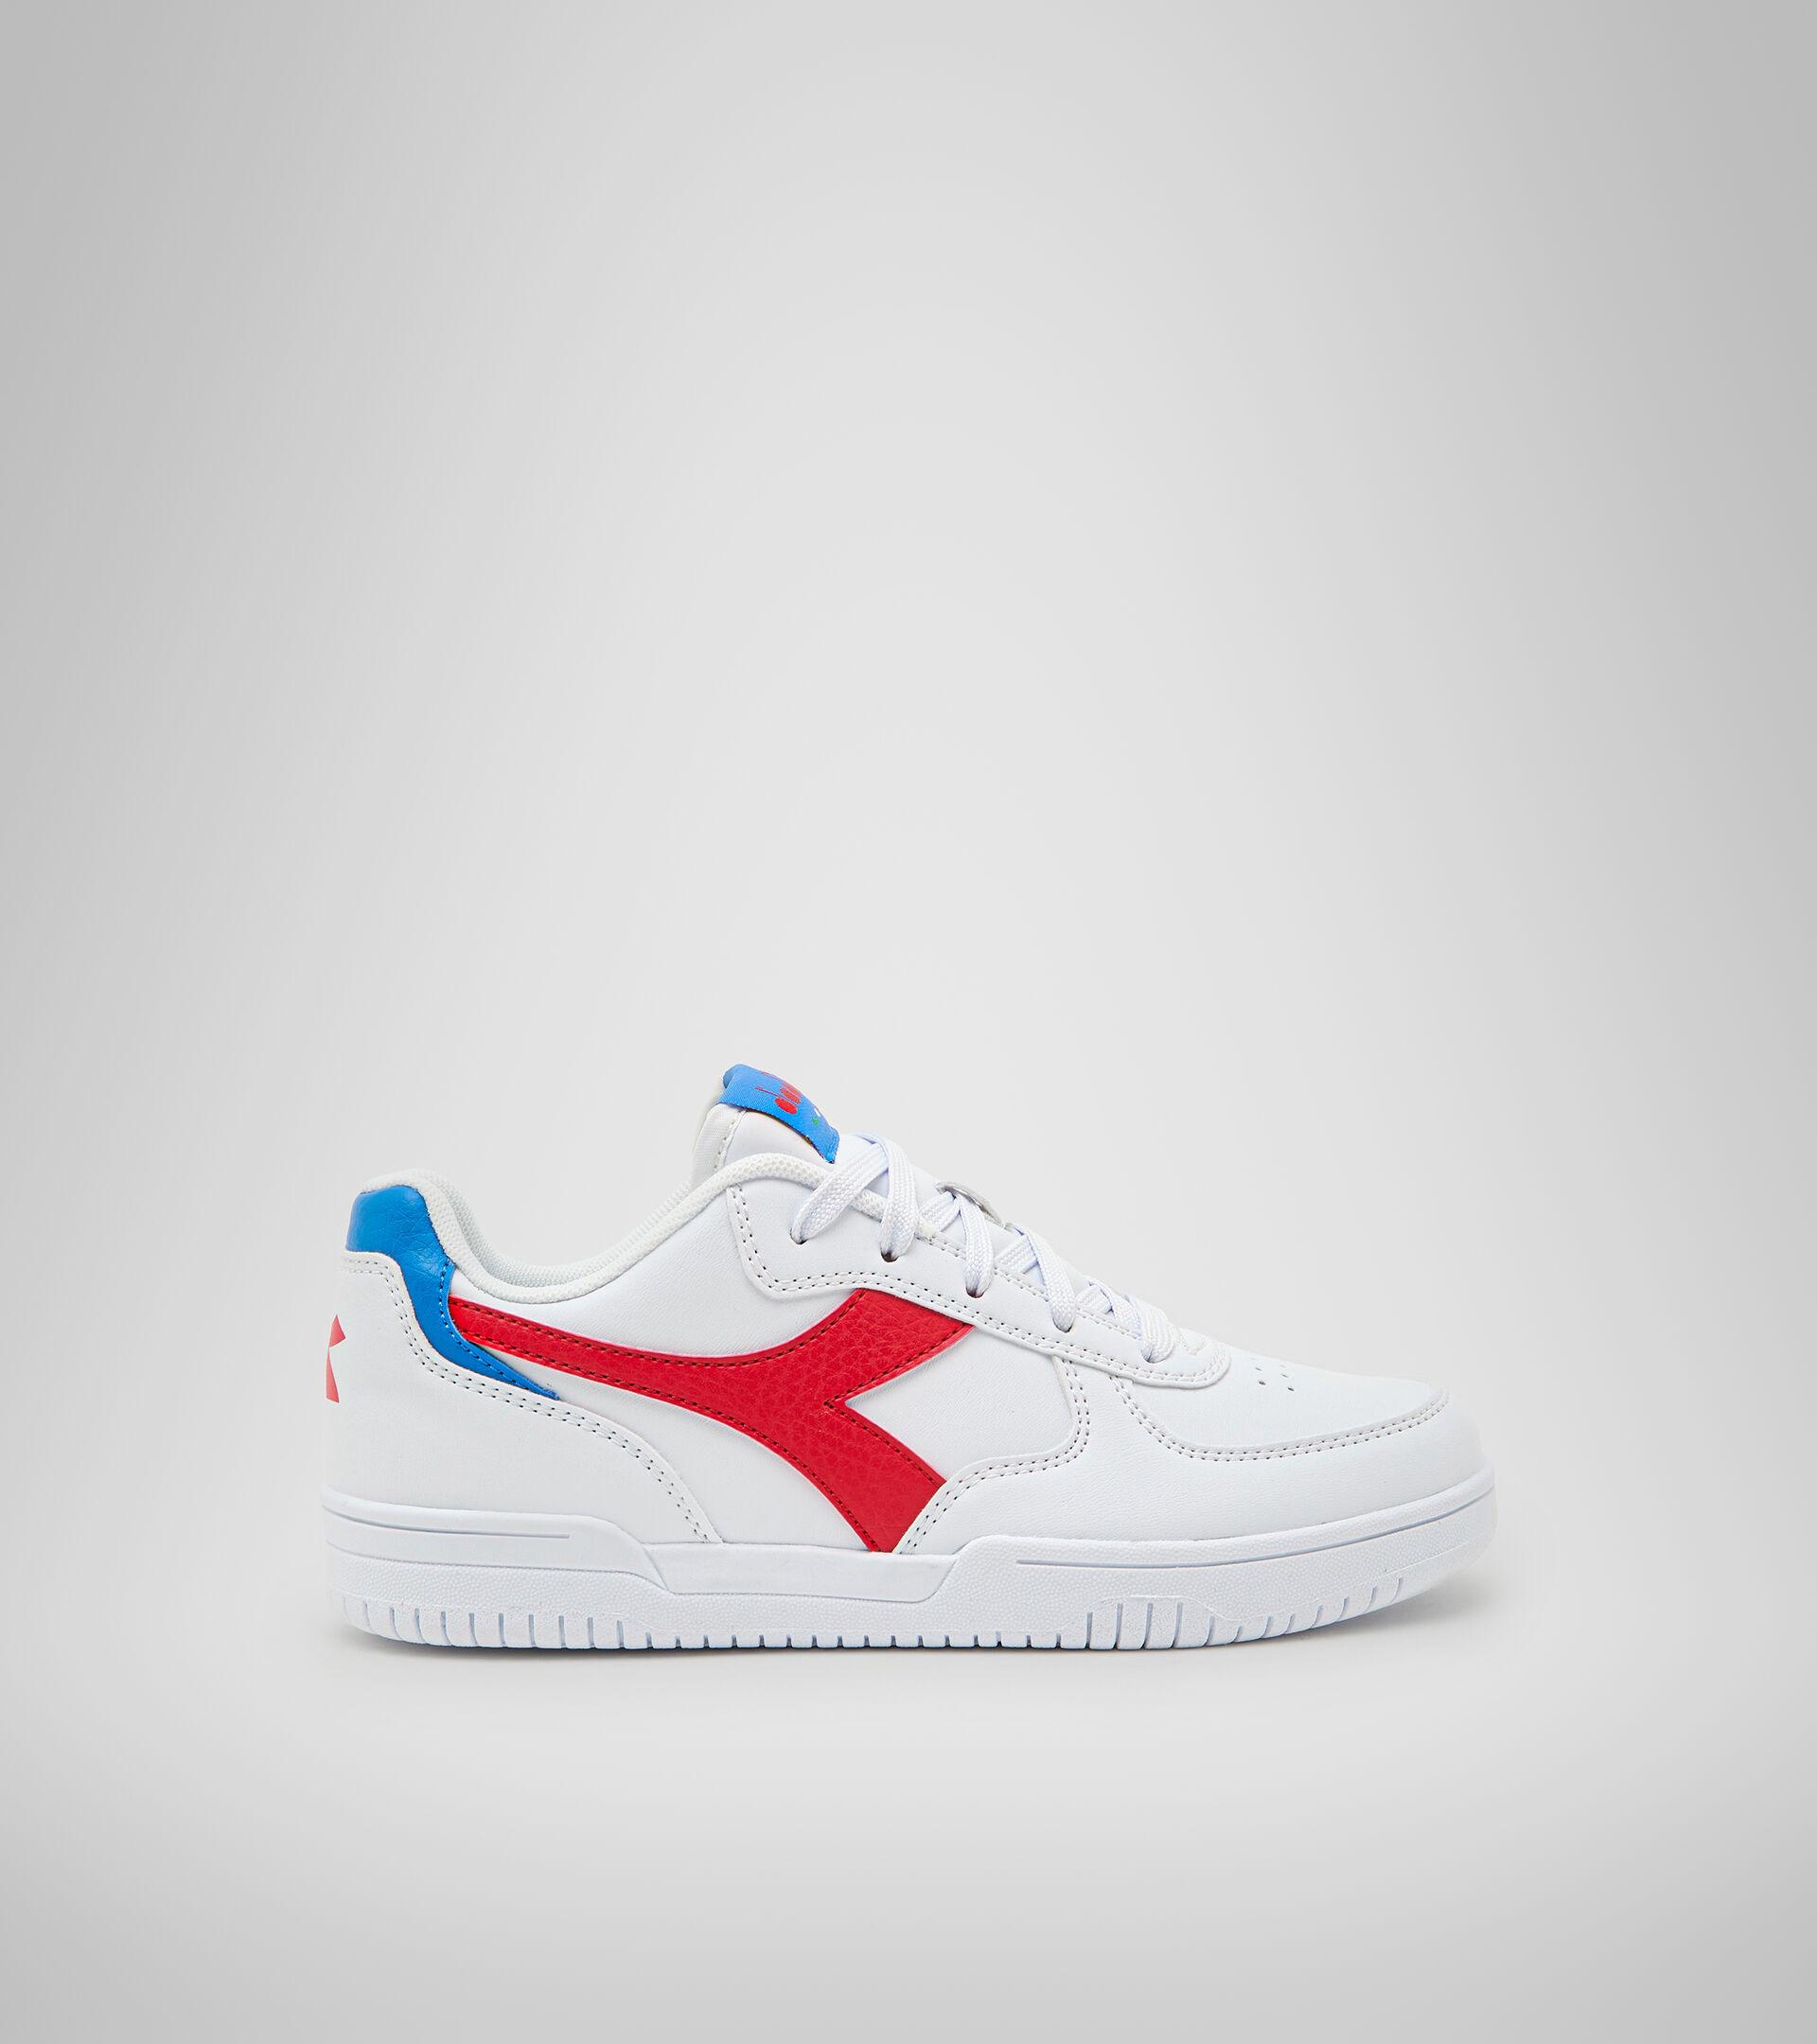 Footwear Sport BAMBINO RAPTOR LOW GS WHITE/TOMATO RED Diadora